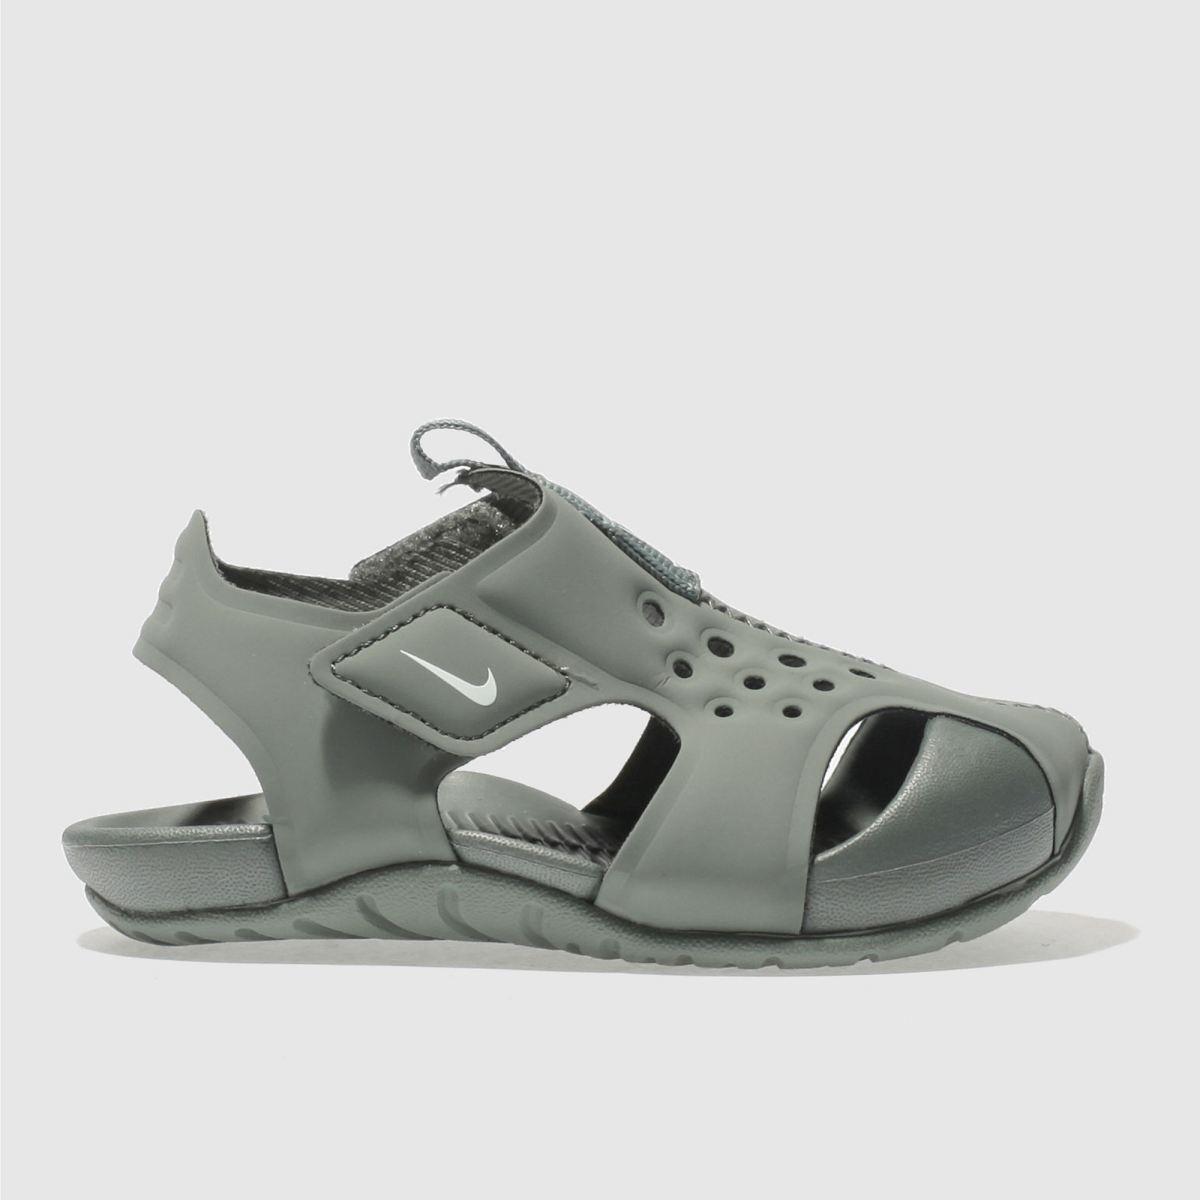 Nike Khaki Sunray Protect 2 Boys Toddler Sandals